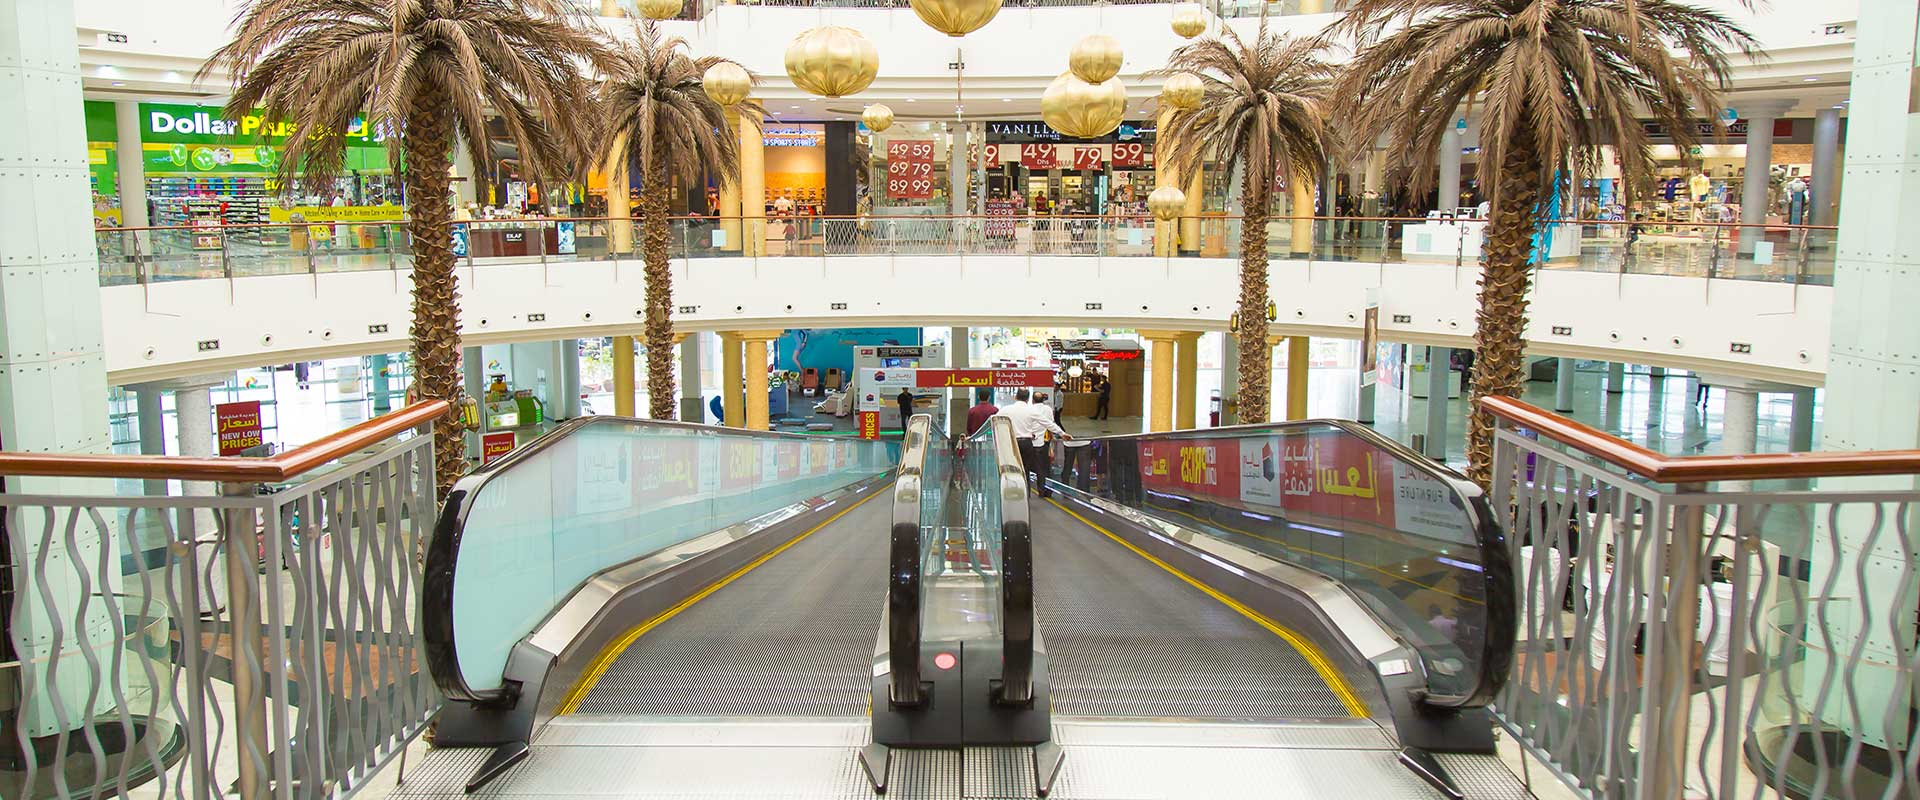 Mall Overview Madina Mall